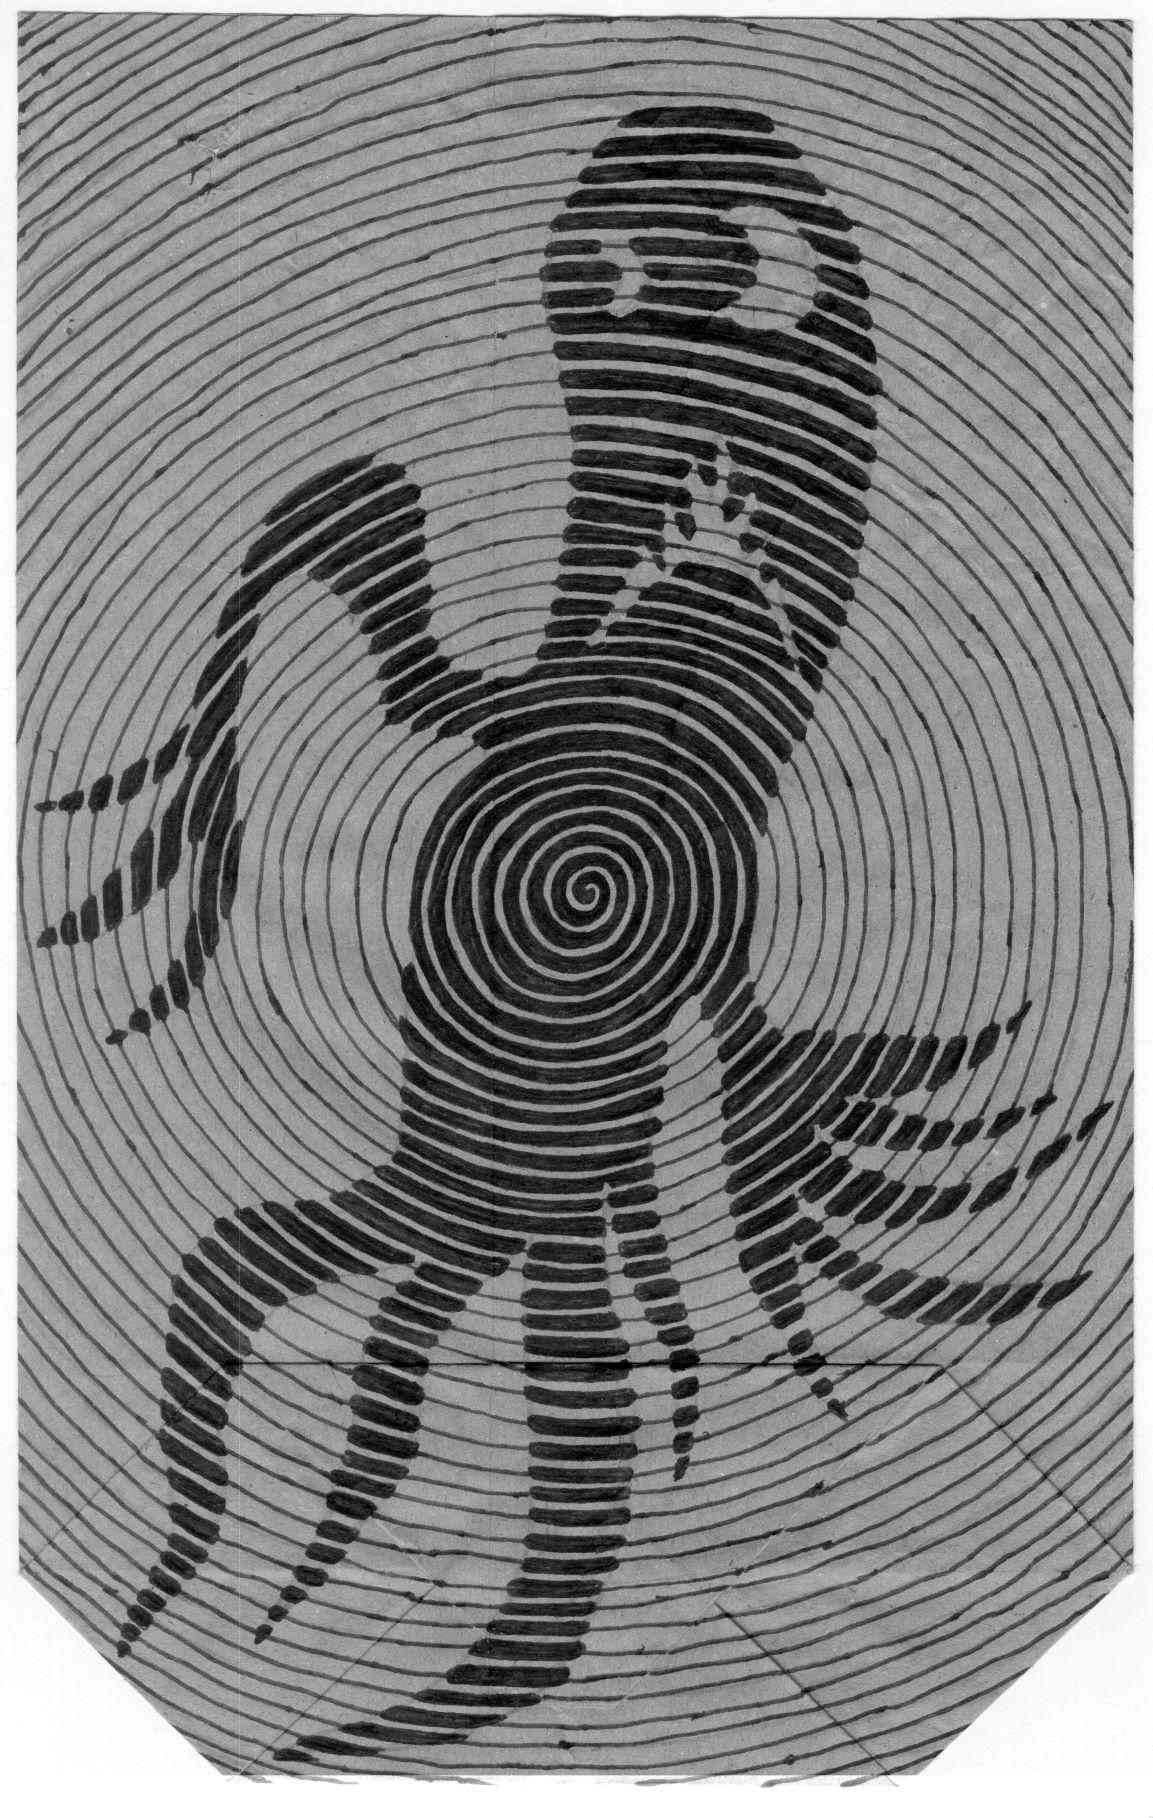 M.S. Bastian / Isabelle L., «Spiral Geist» © M.S. Bastian / Isabelle L.